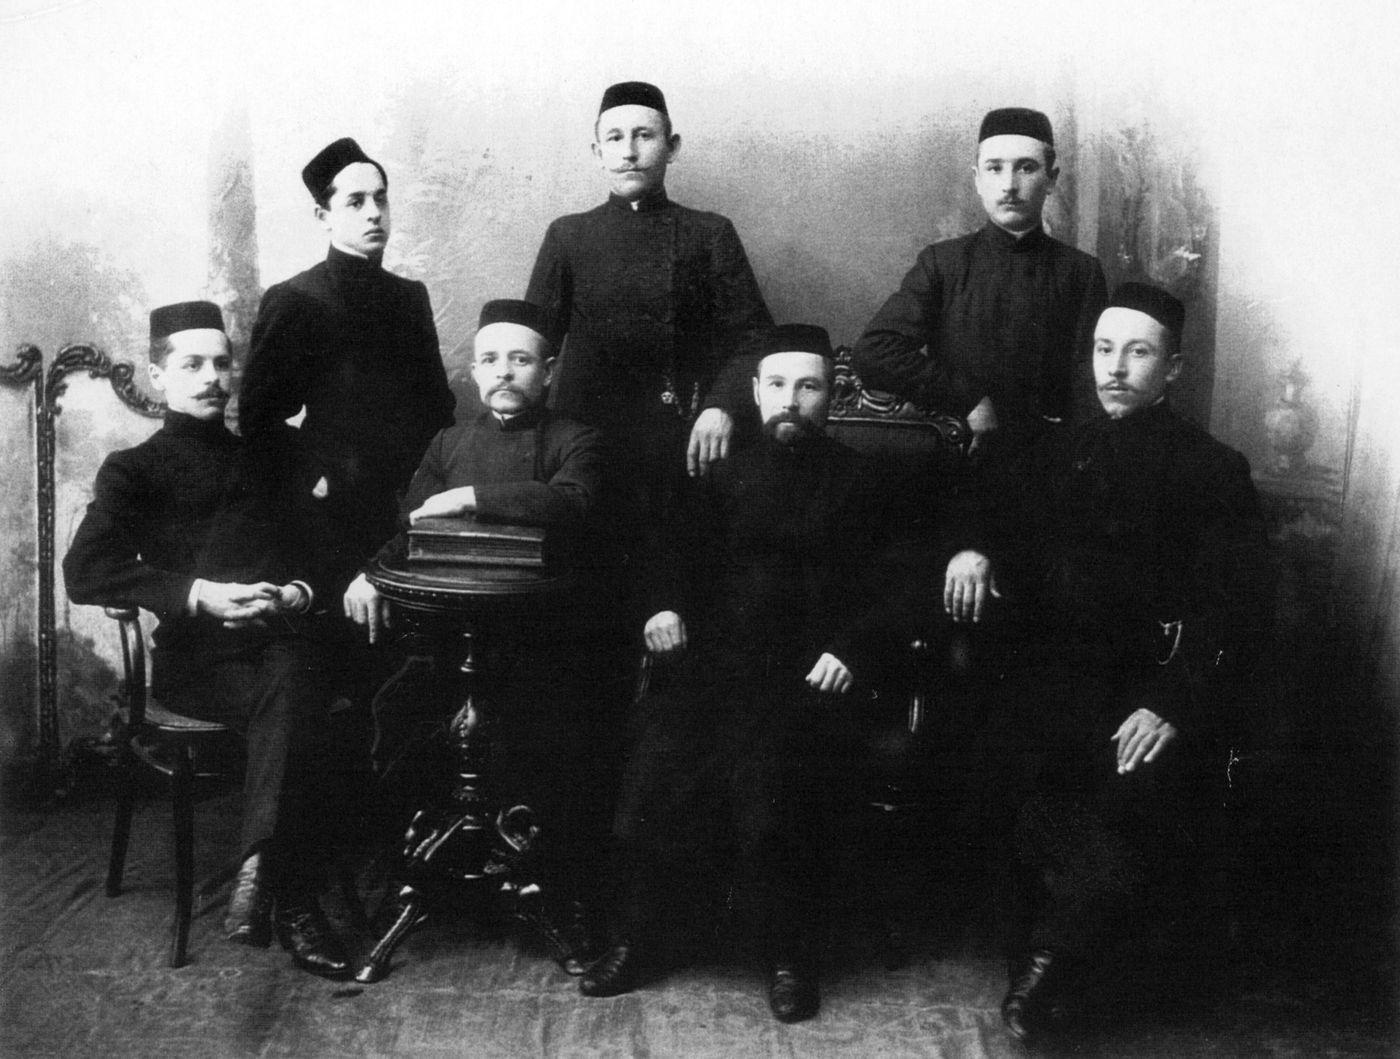 Сотрудники журнала «Анг». Фотография. Начало XX в.